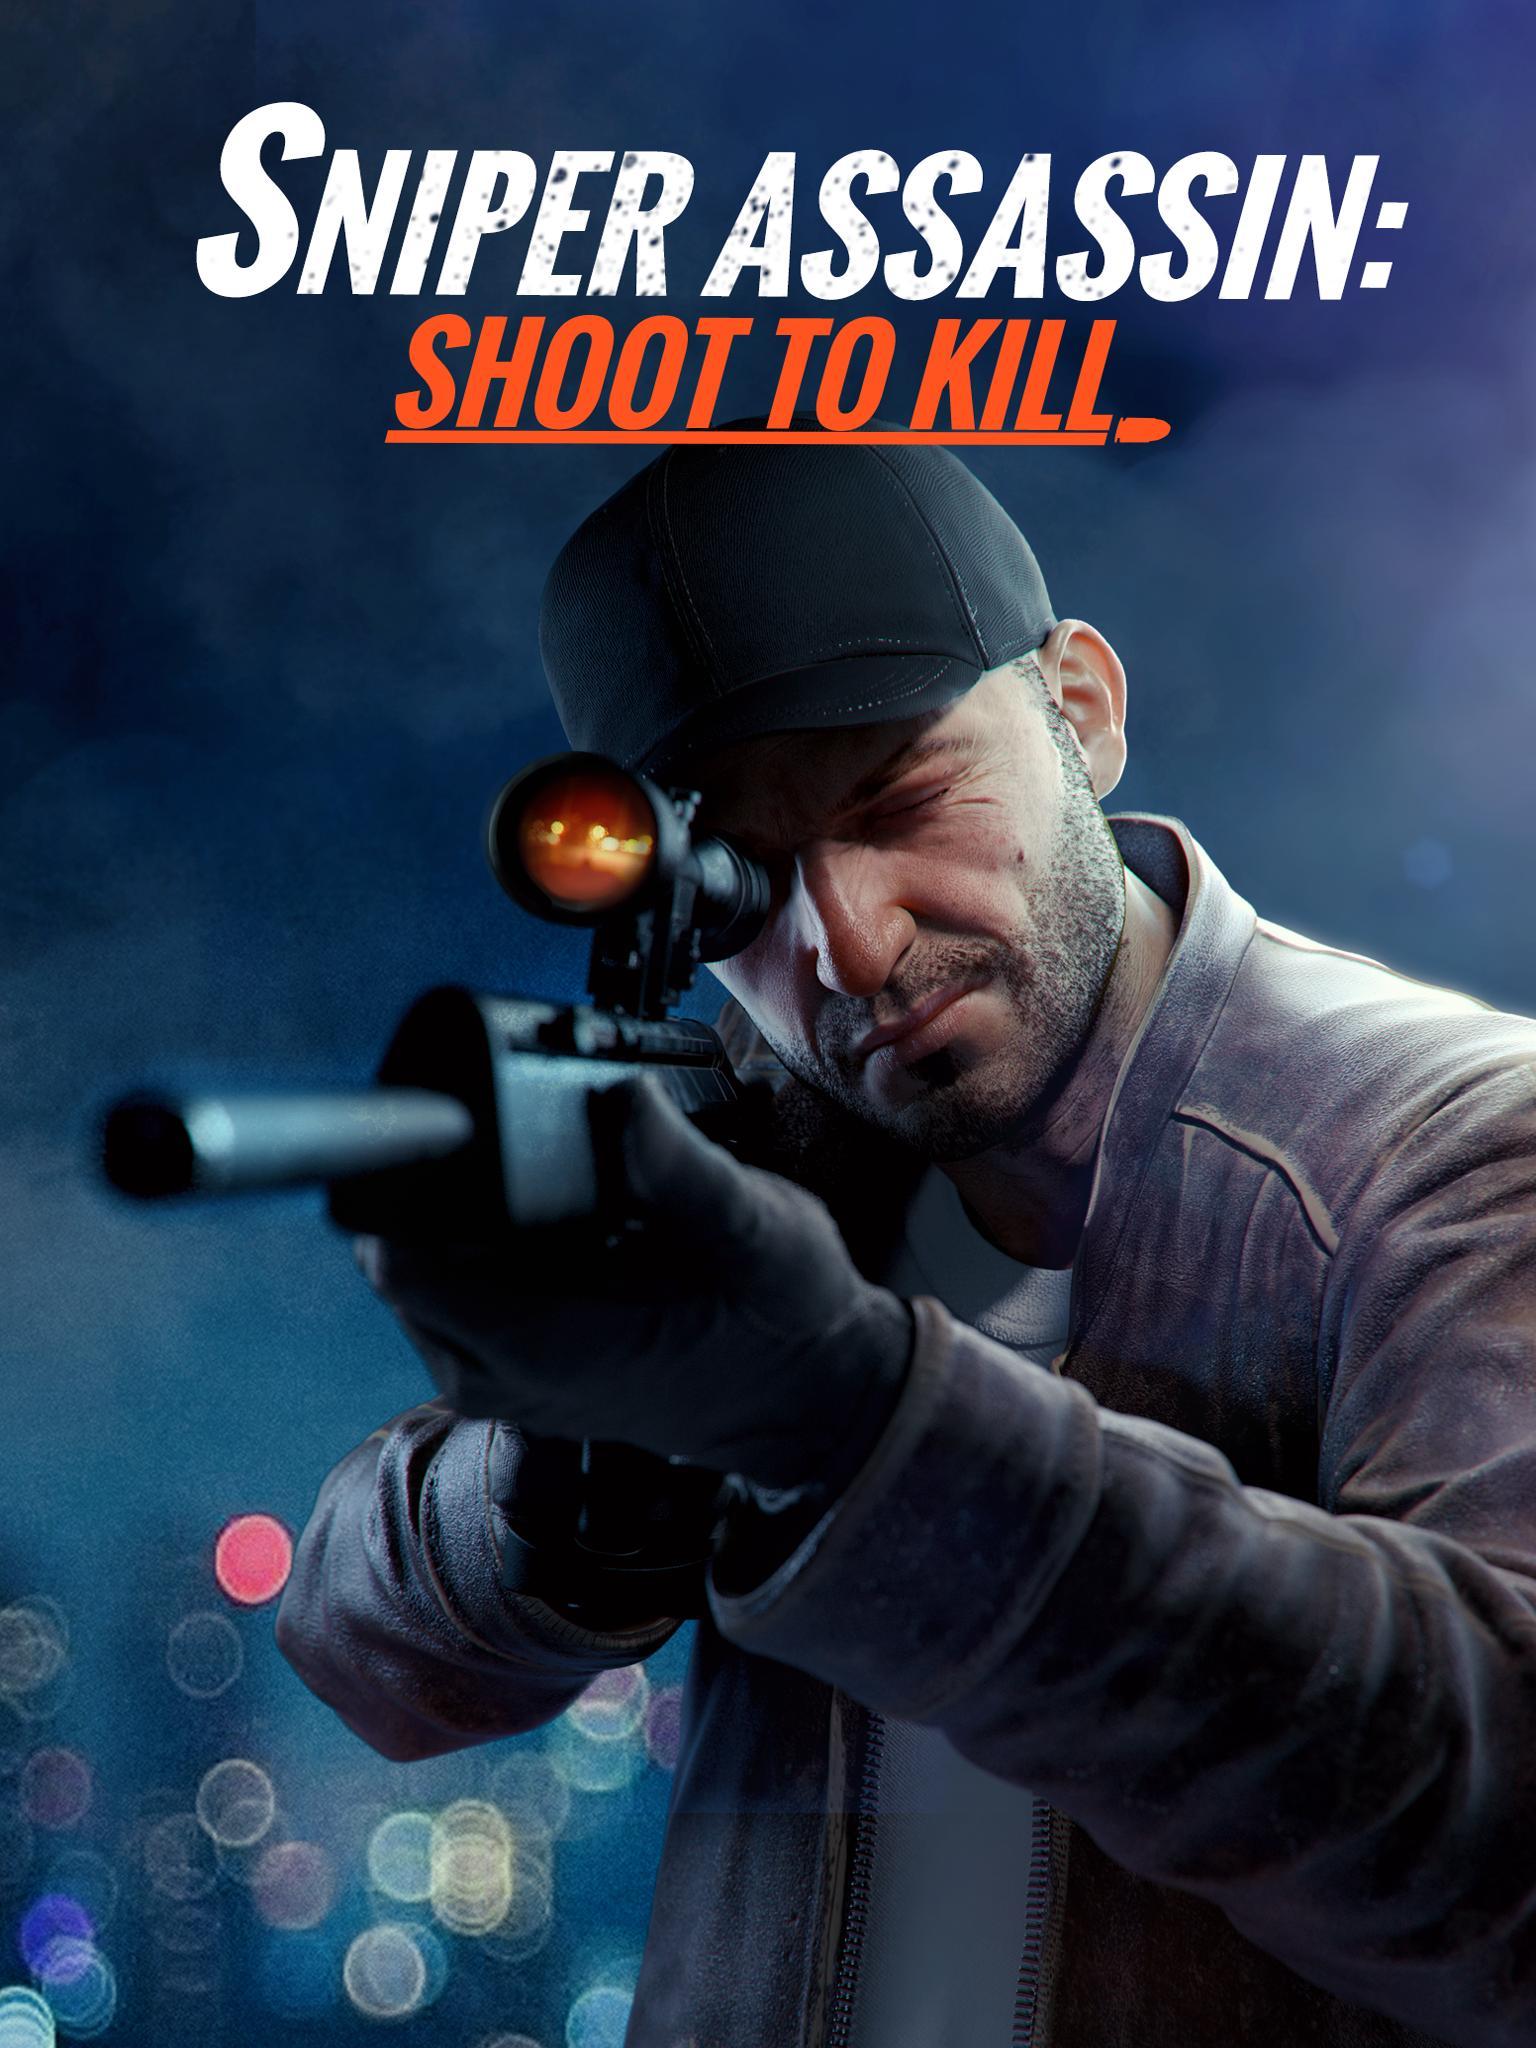 Sniper 3D Fun Free Online FPS Shooting Game 3.15.1 Screenshot 7